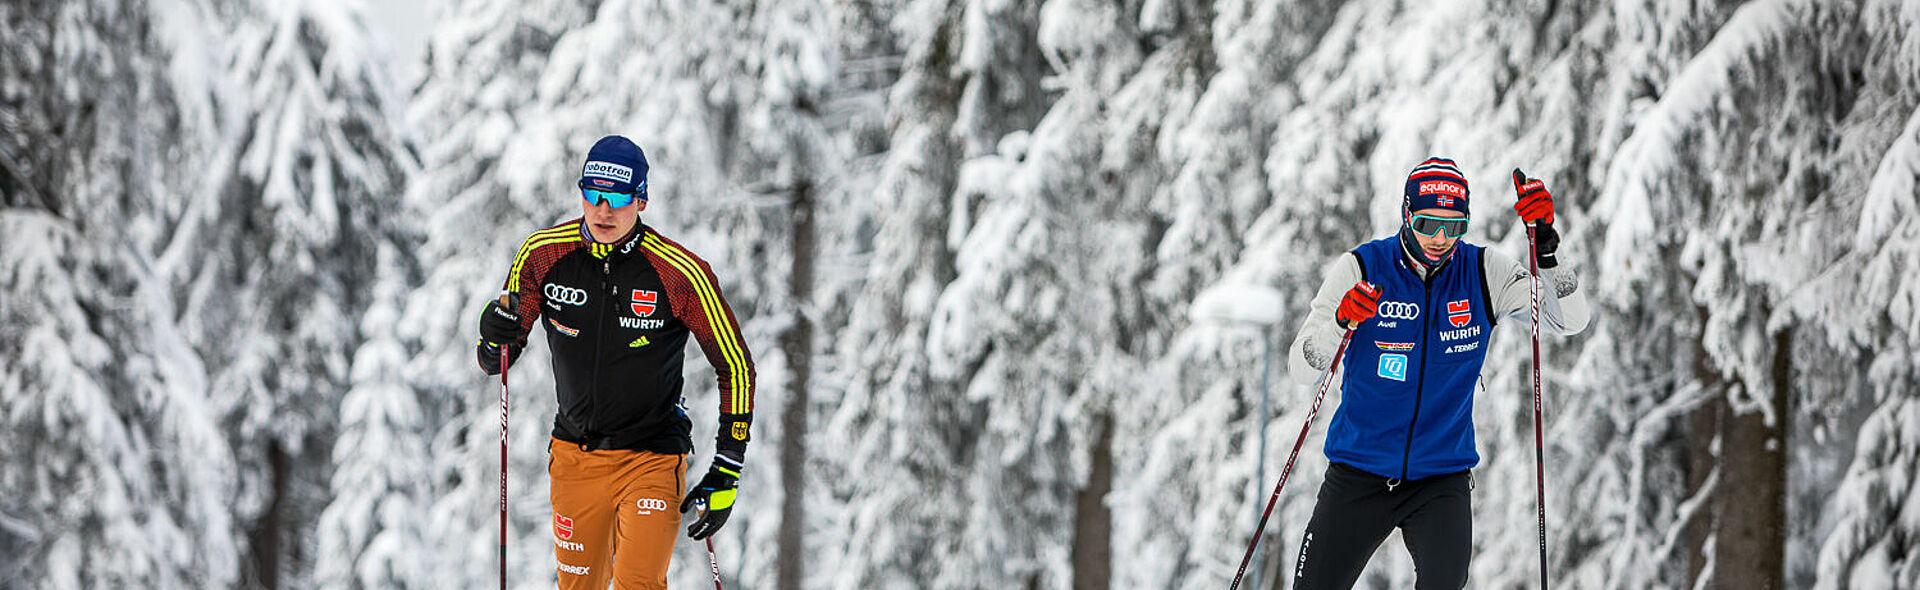 Oberwiesenthal Skilanglauf Nordische Kombination Biathlon Fichtelberg Loipe Trainingszentrum TrainingCenter Richard Leupold Maxim Cervinka